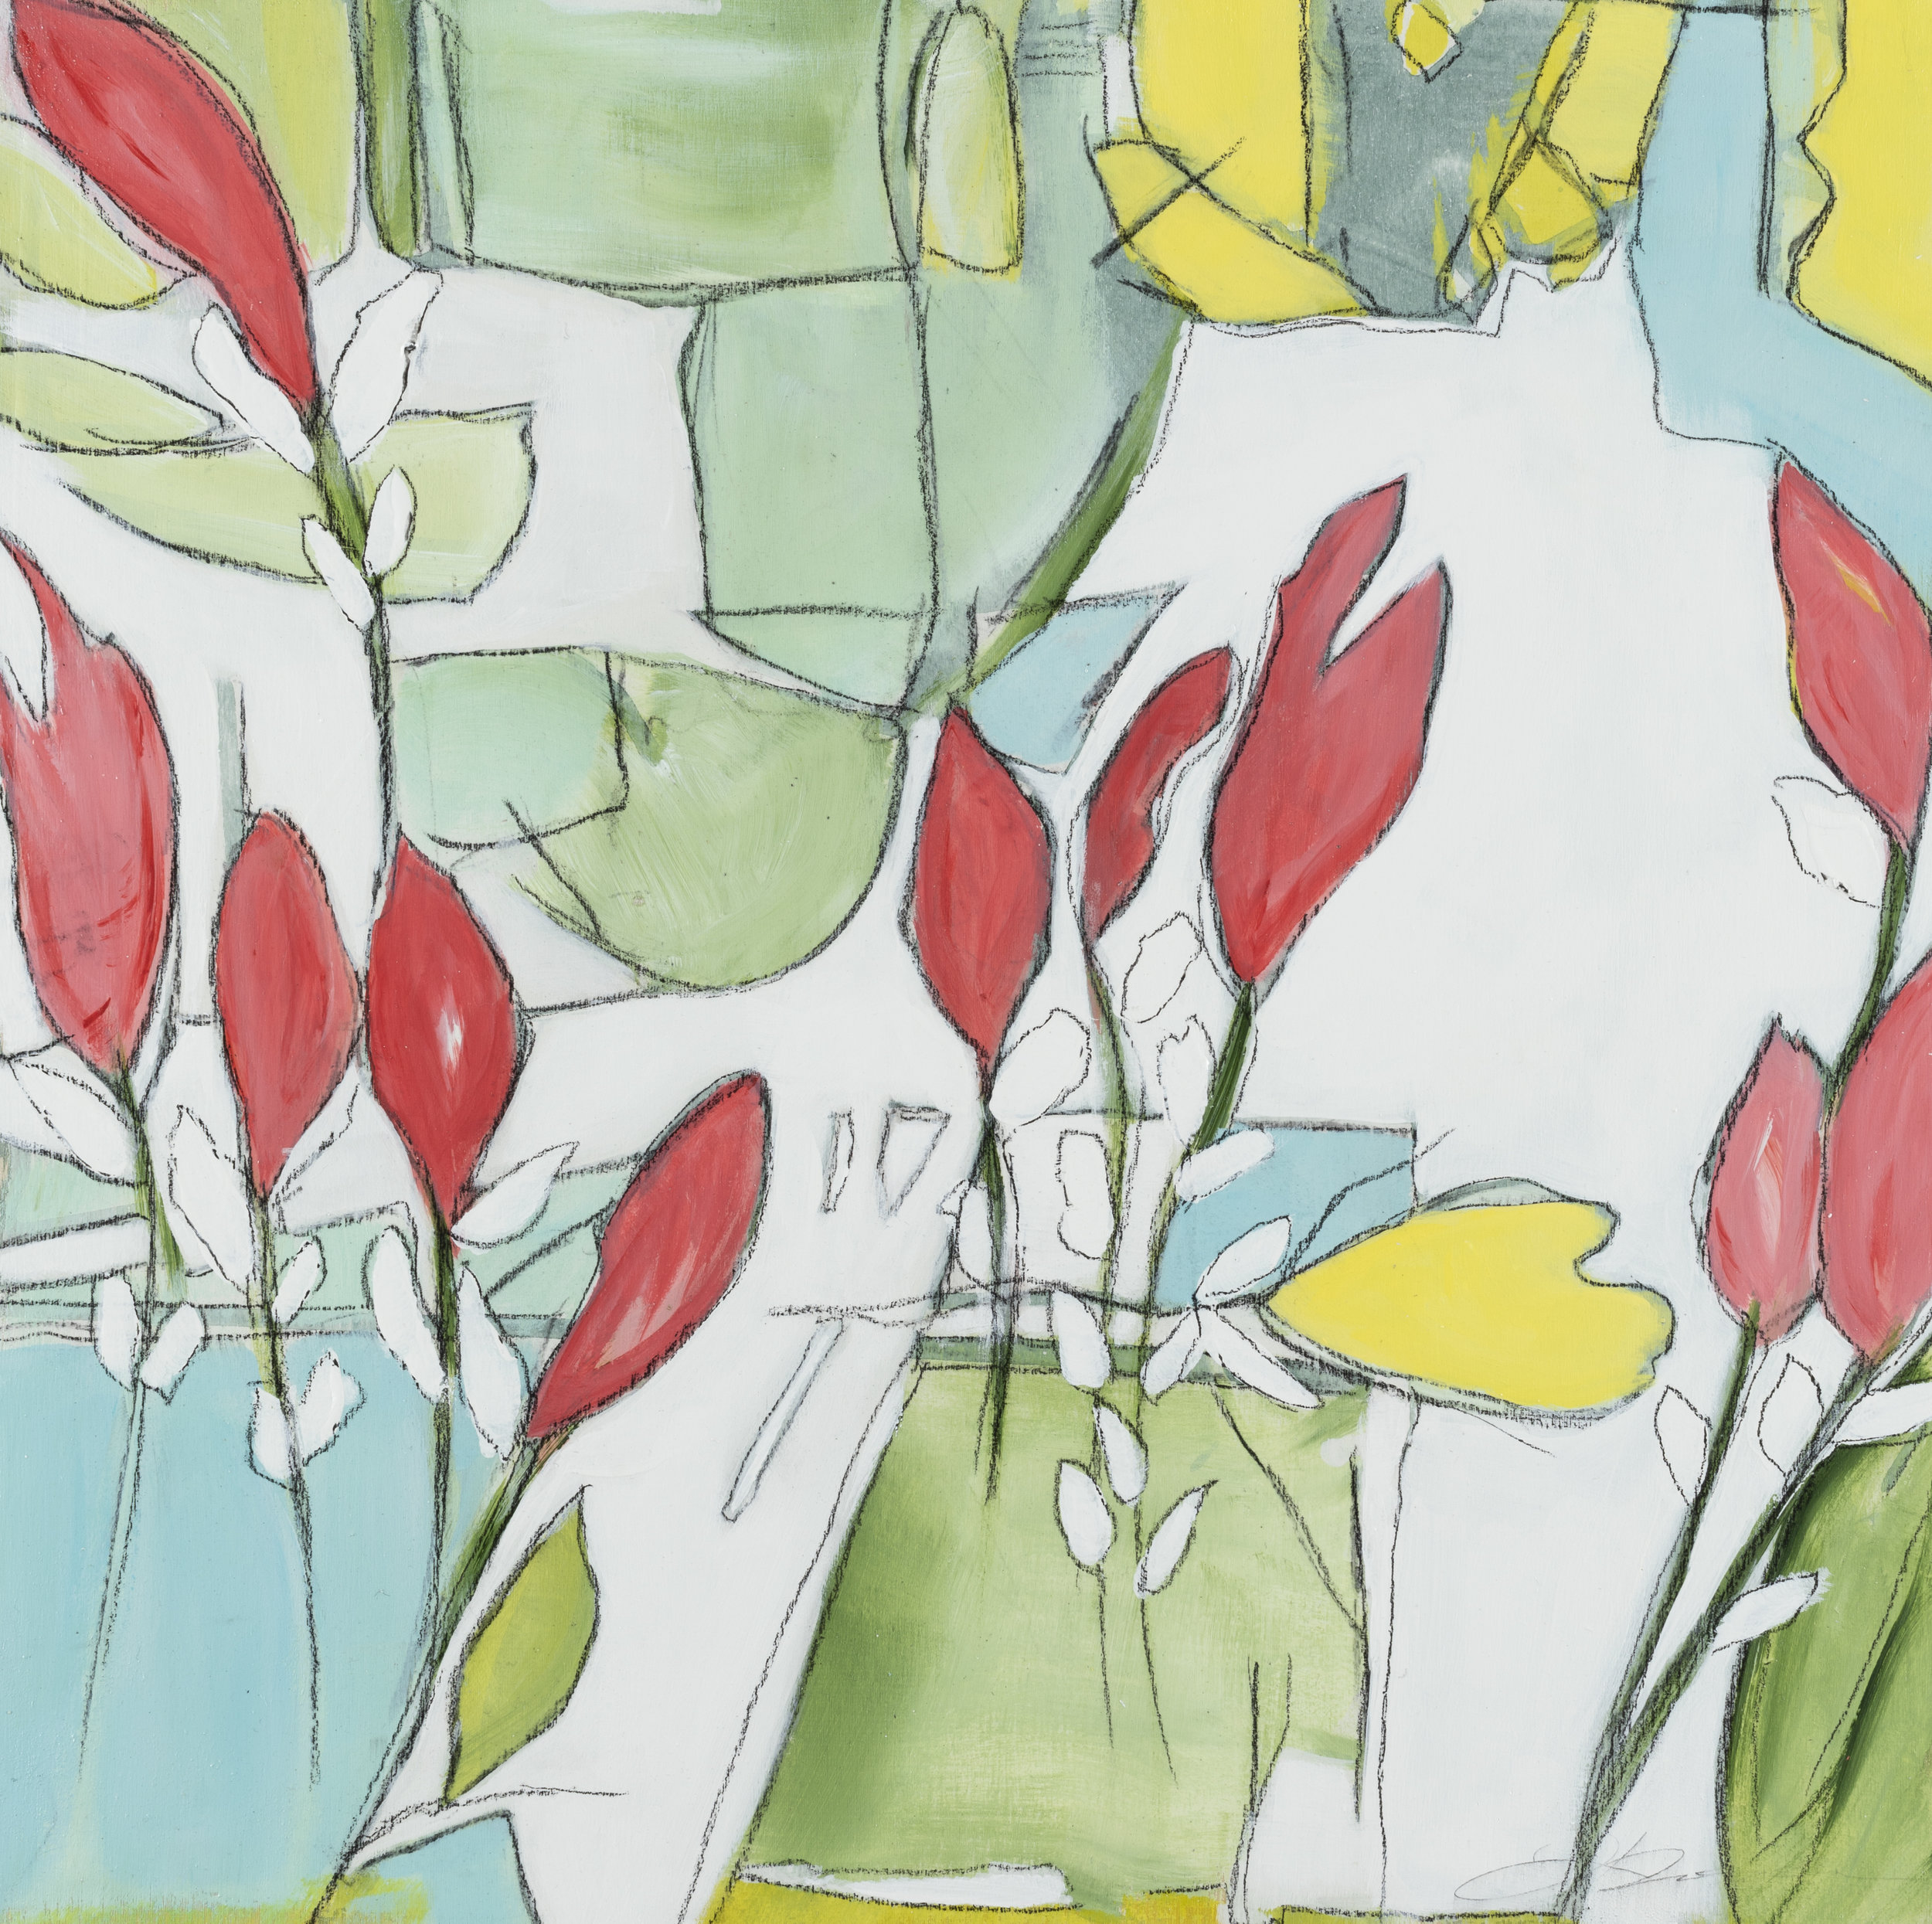 "Terrace Garden - 17.5"" x 17.5"" x 1""Acrylic, pastel, panel, framed$400"